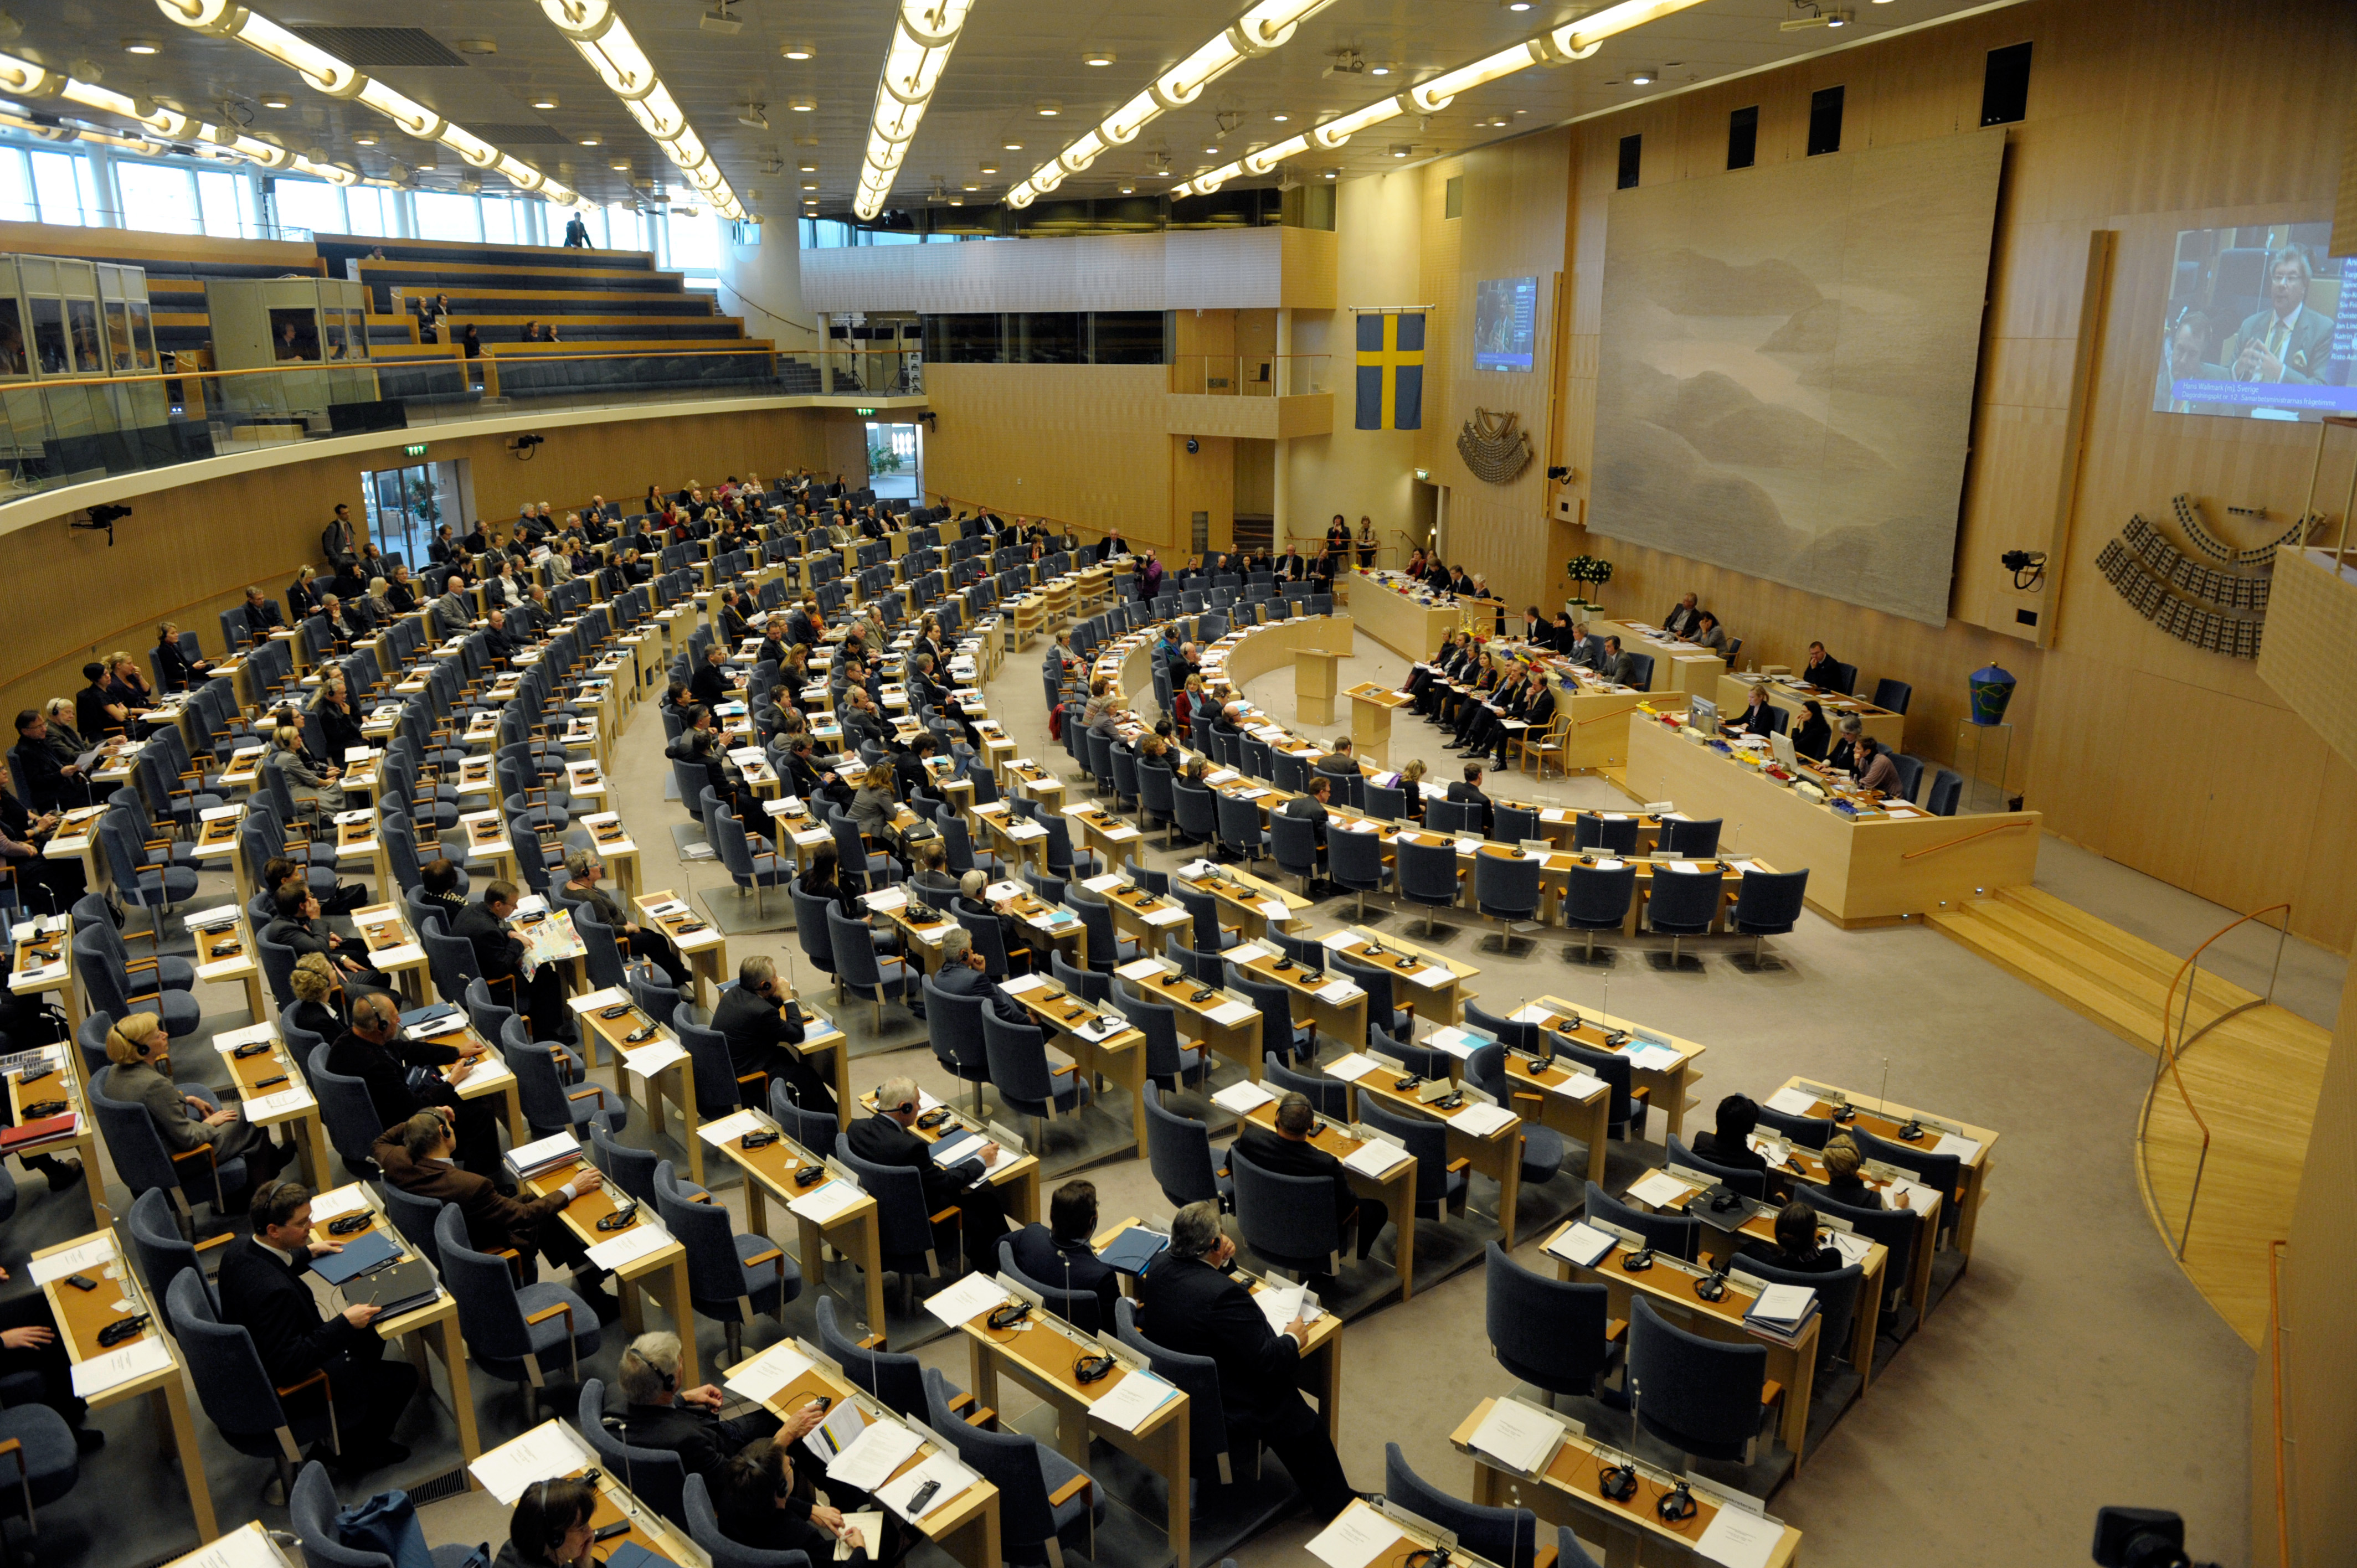 Filenordiska Radets Session I Riksdagen I Stockholm  Jpg